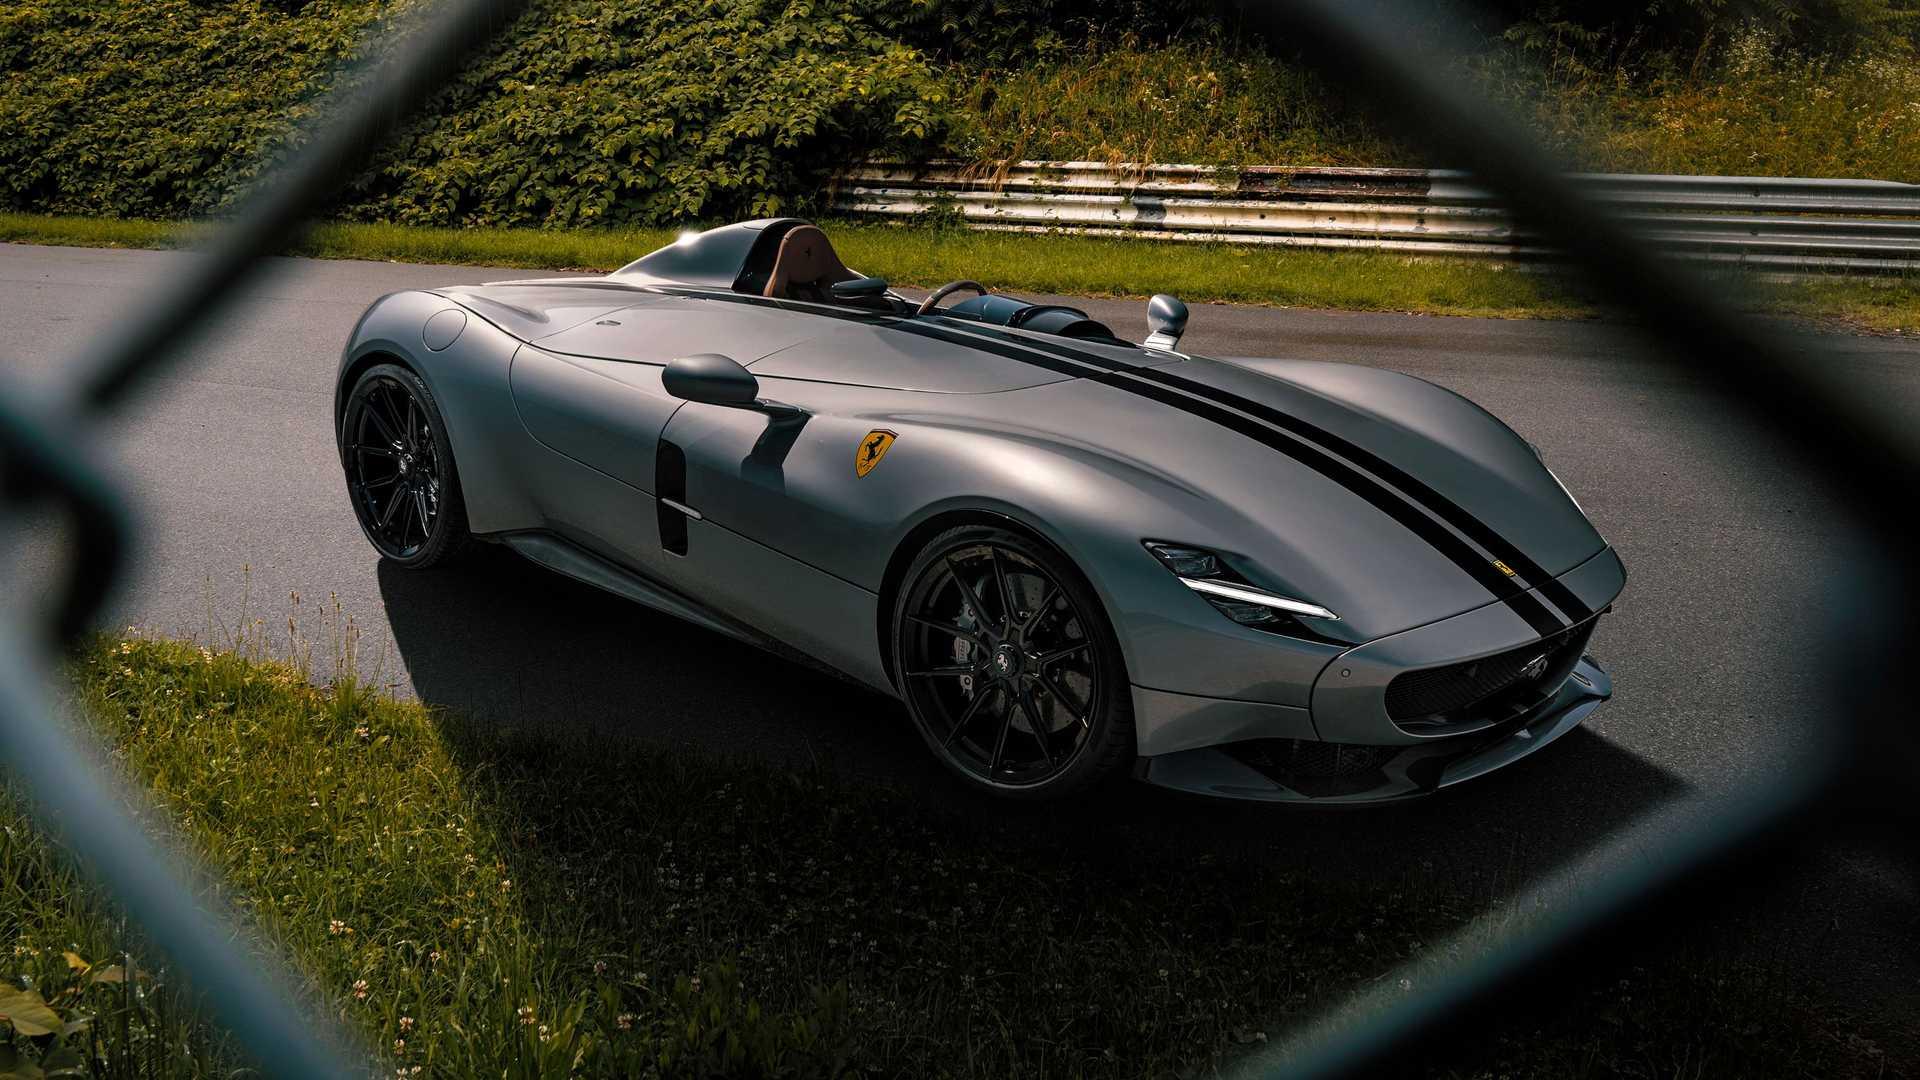 Ferrari_Monza_SP1_tuning_by_Novitec_0001